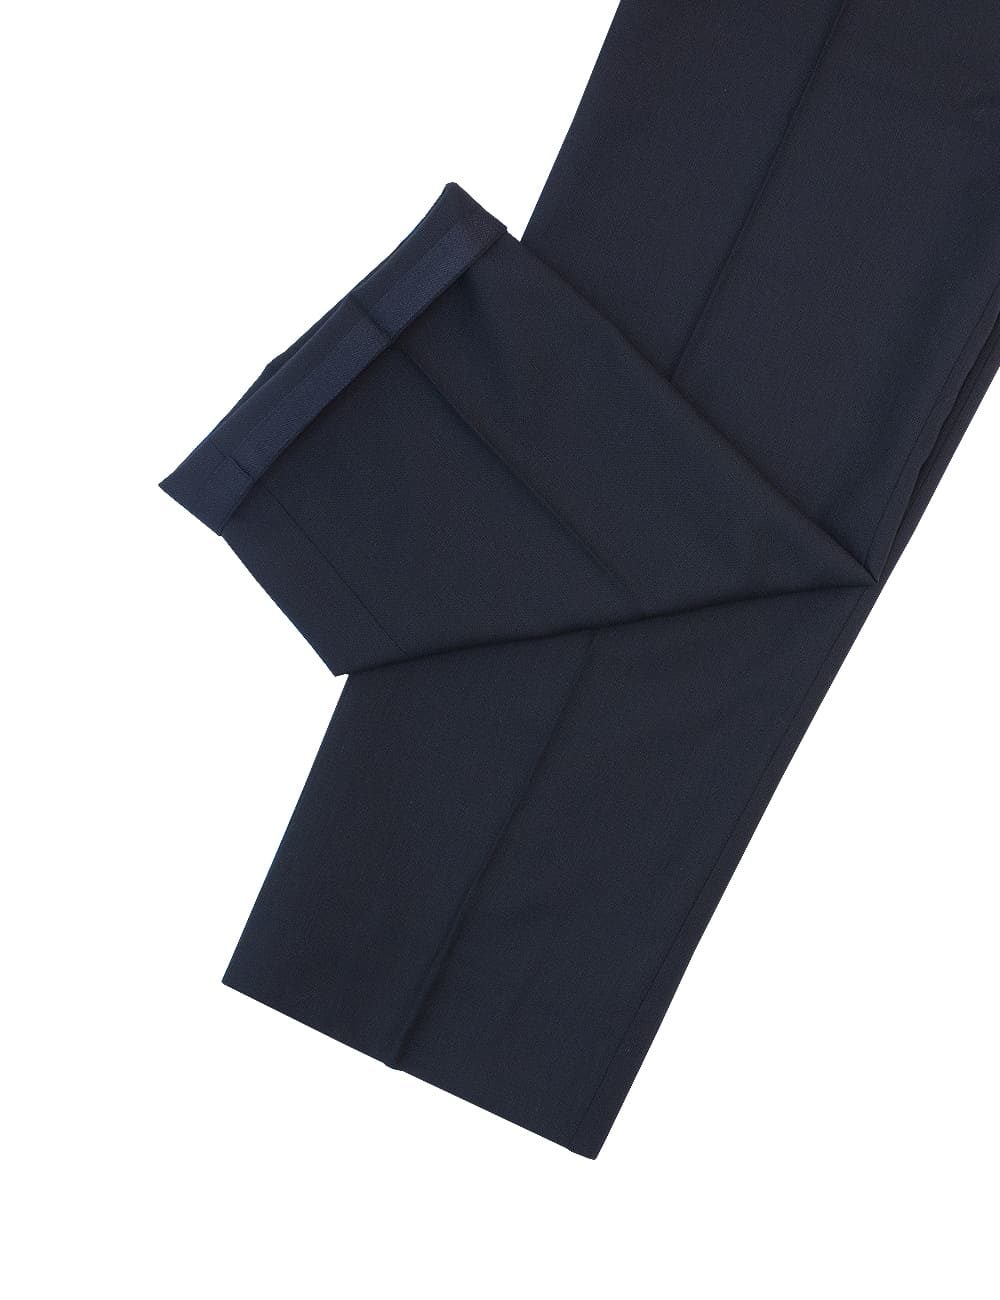 Classic Fit Jetsetter Black 100% Wool Smart Pocket & Flexi-waist Flat Front Dress Pants DPC1E1.2